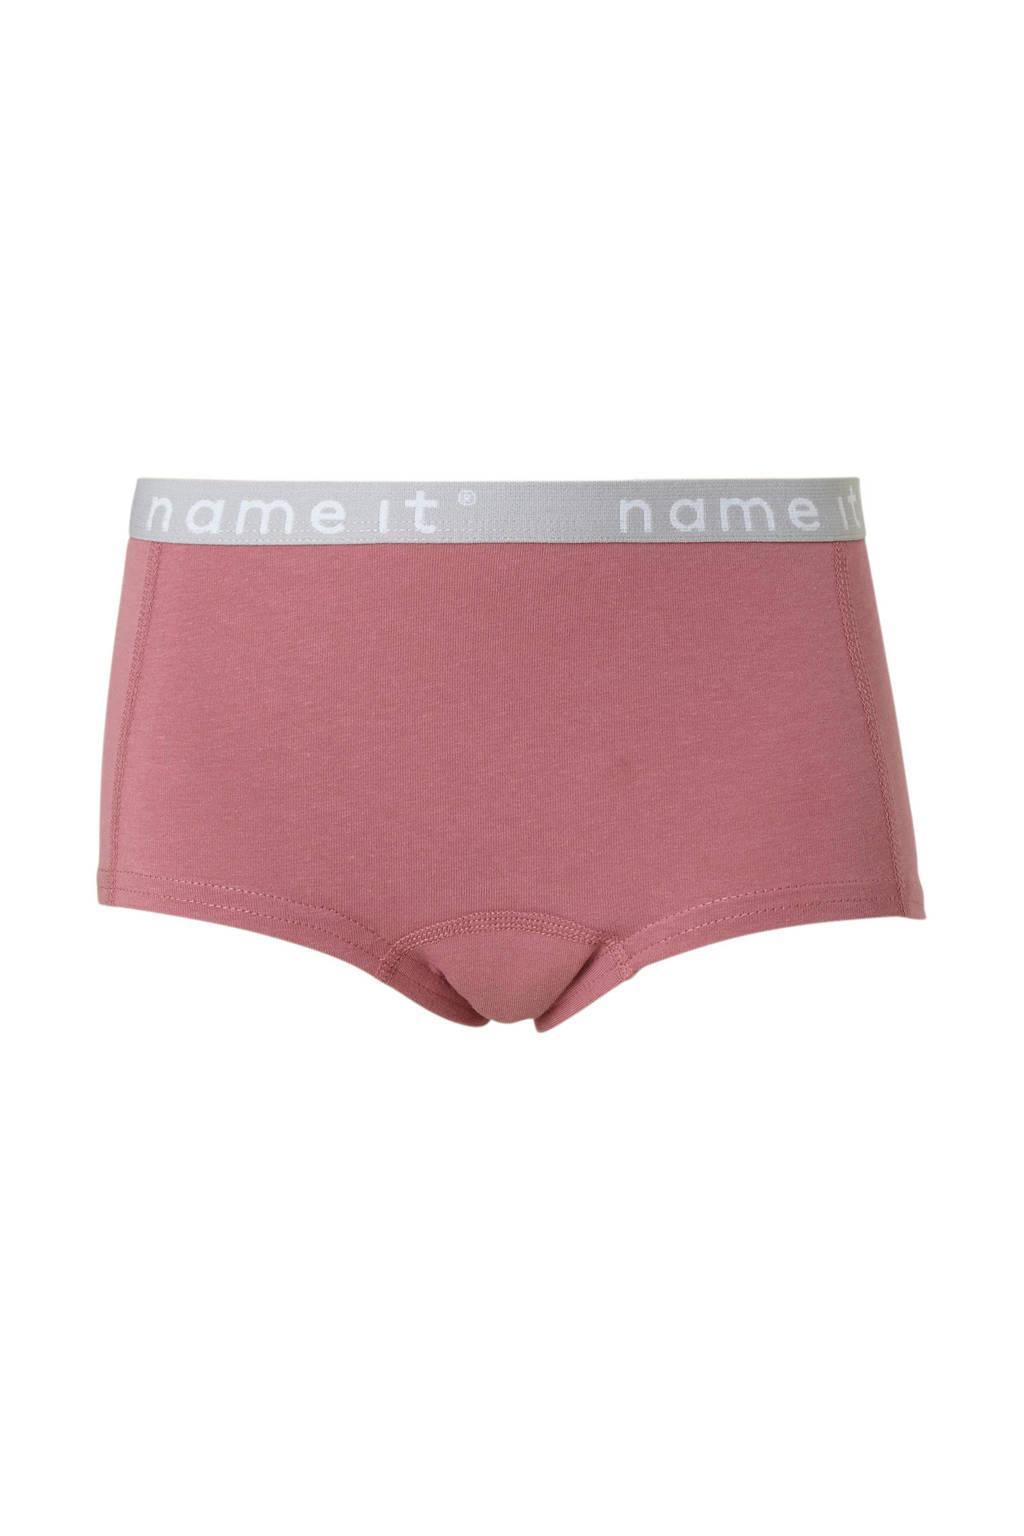 NAME IT KIDS short - set van 2, roze/ wit